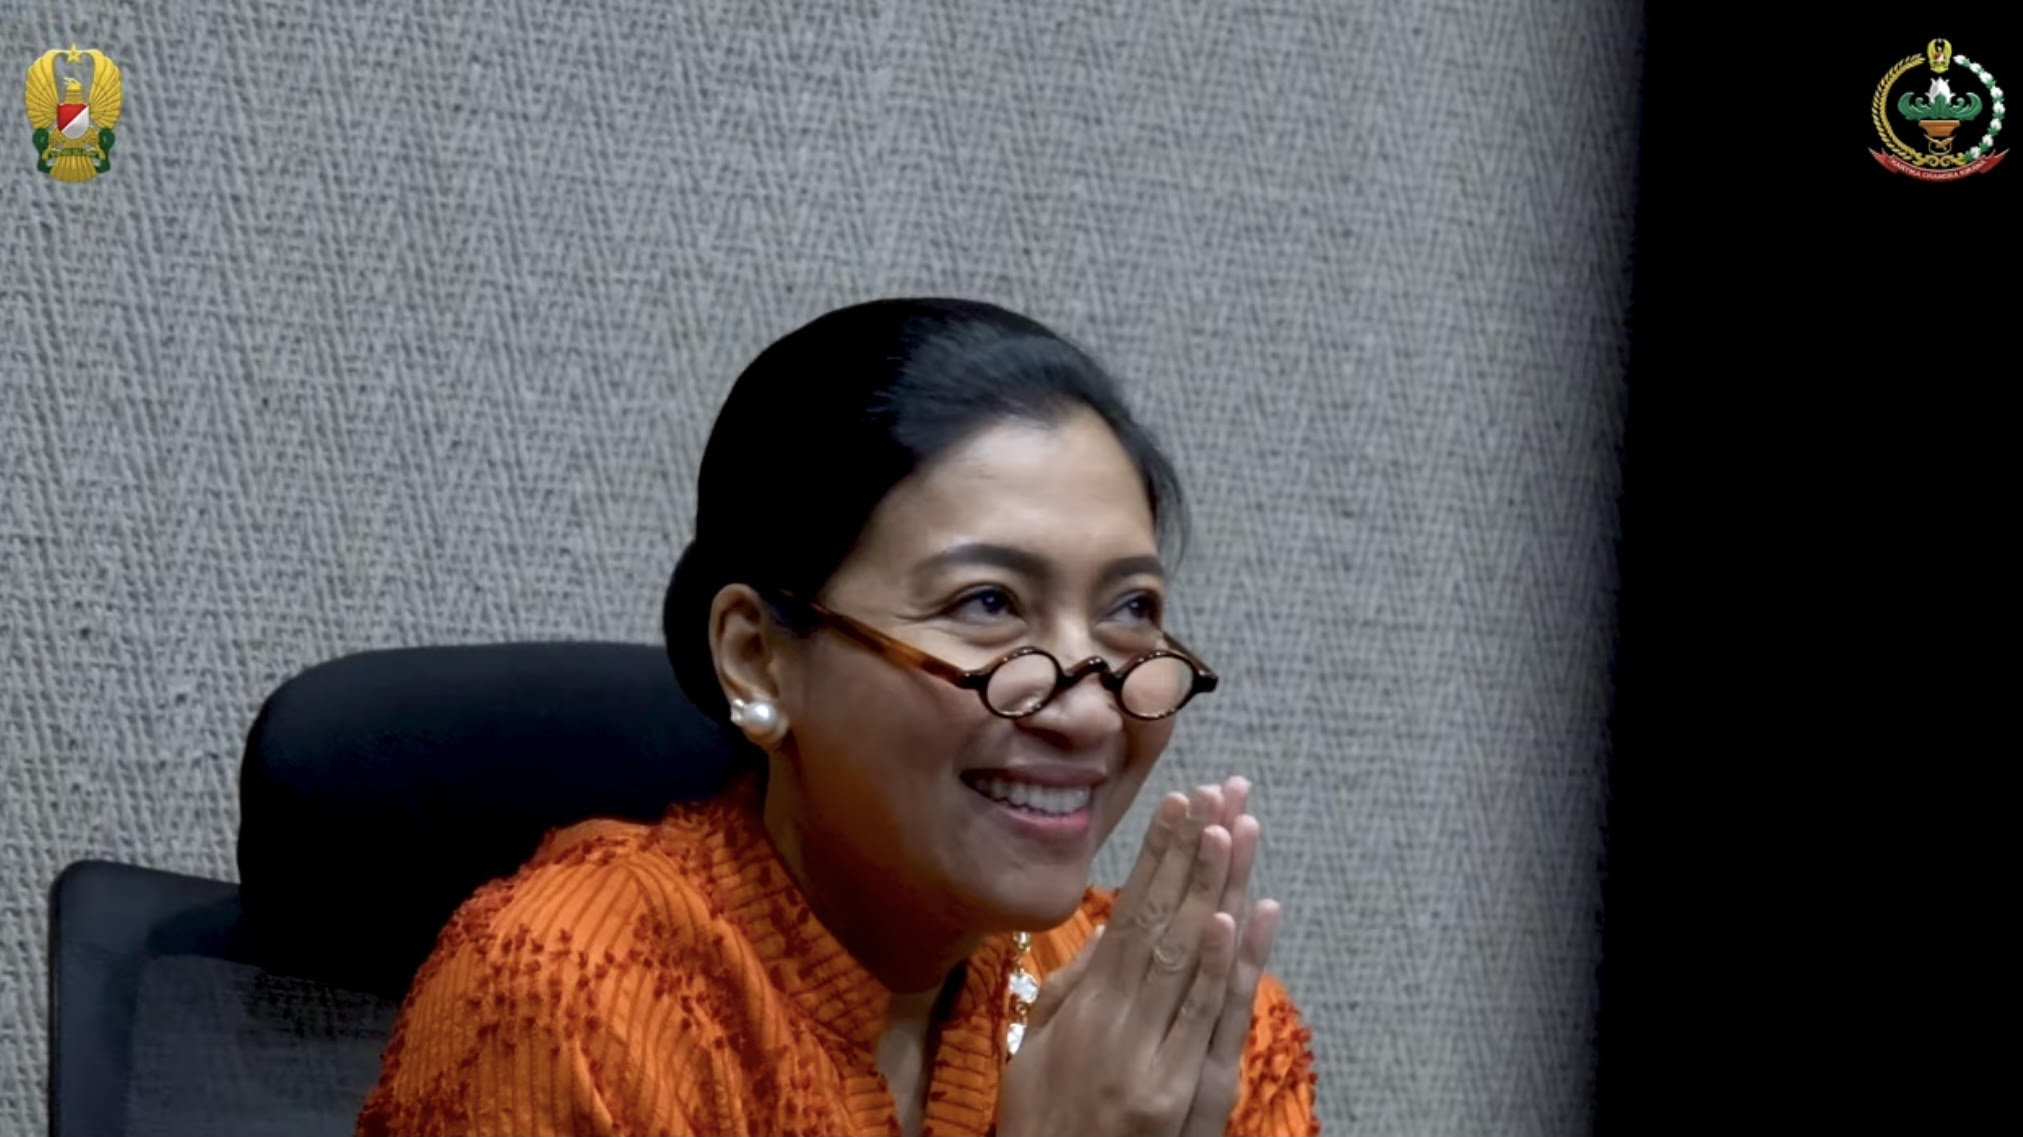 Hetty Andika Perkasa Harap Program Dekranas Bikin UMKM Lebih Bersaing - JPNN.com